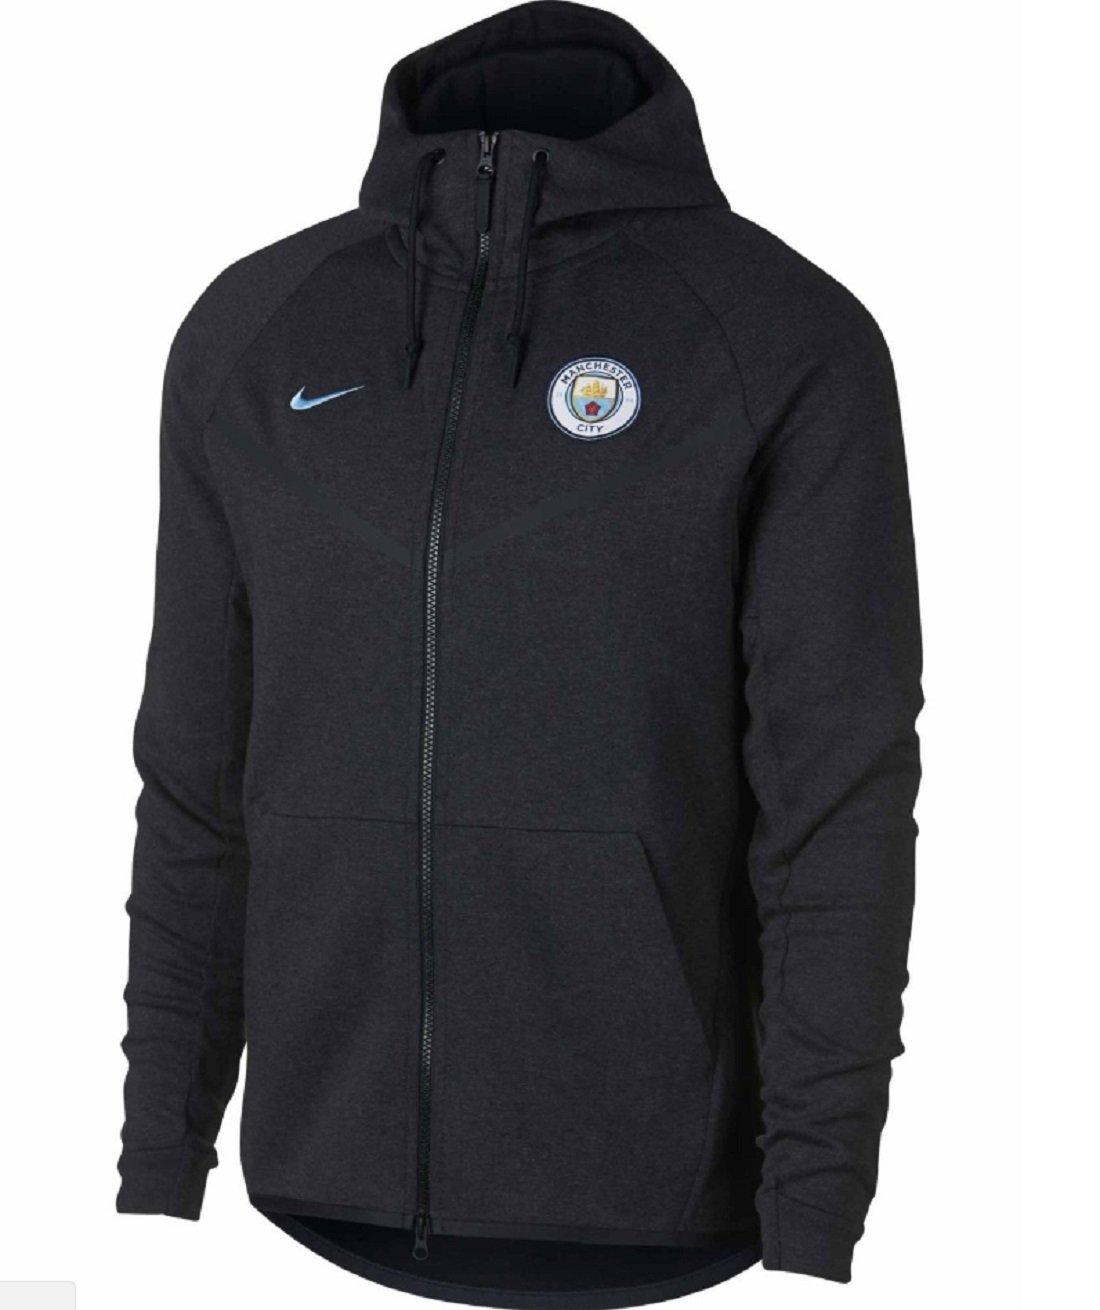 Nike Herren Manchester Jacke City Tech Fleece Windrunner Kapuzen Jacke  Manchester f4036b 3e769463aa